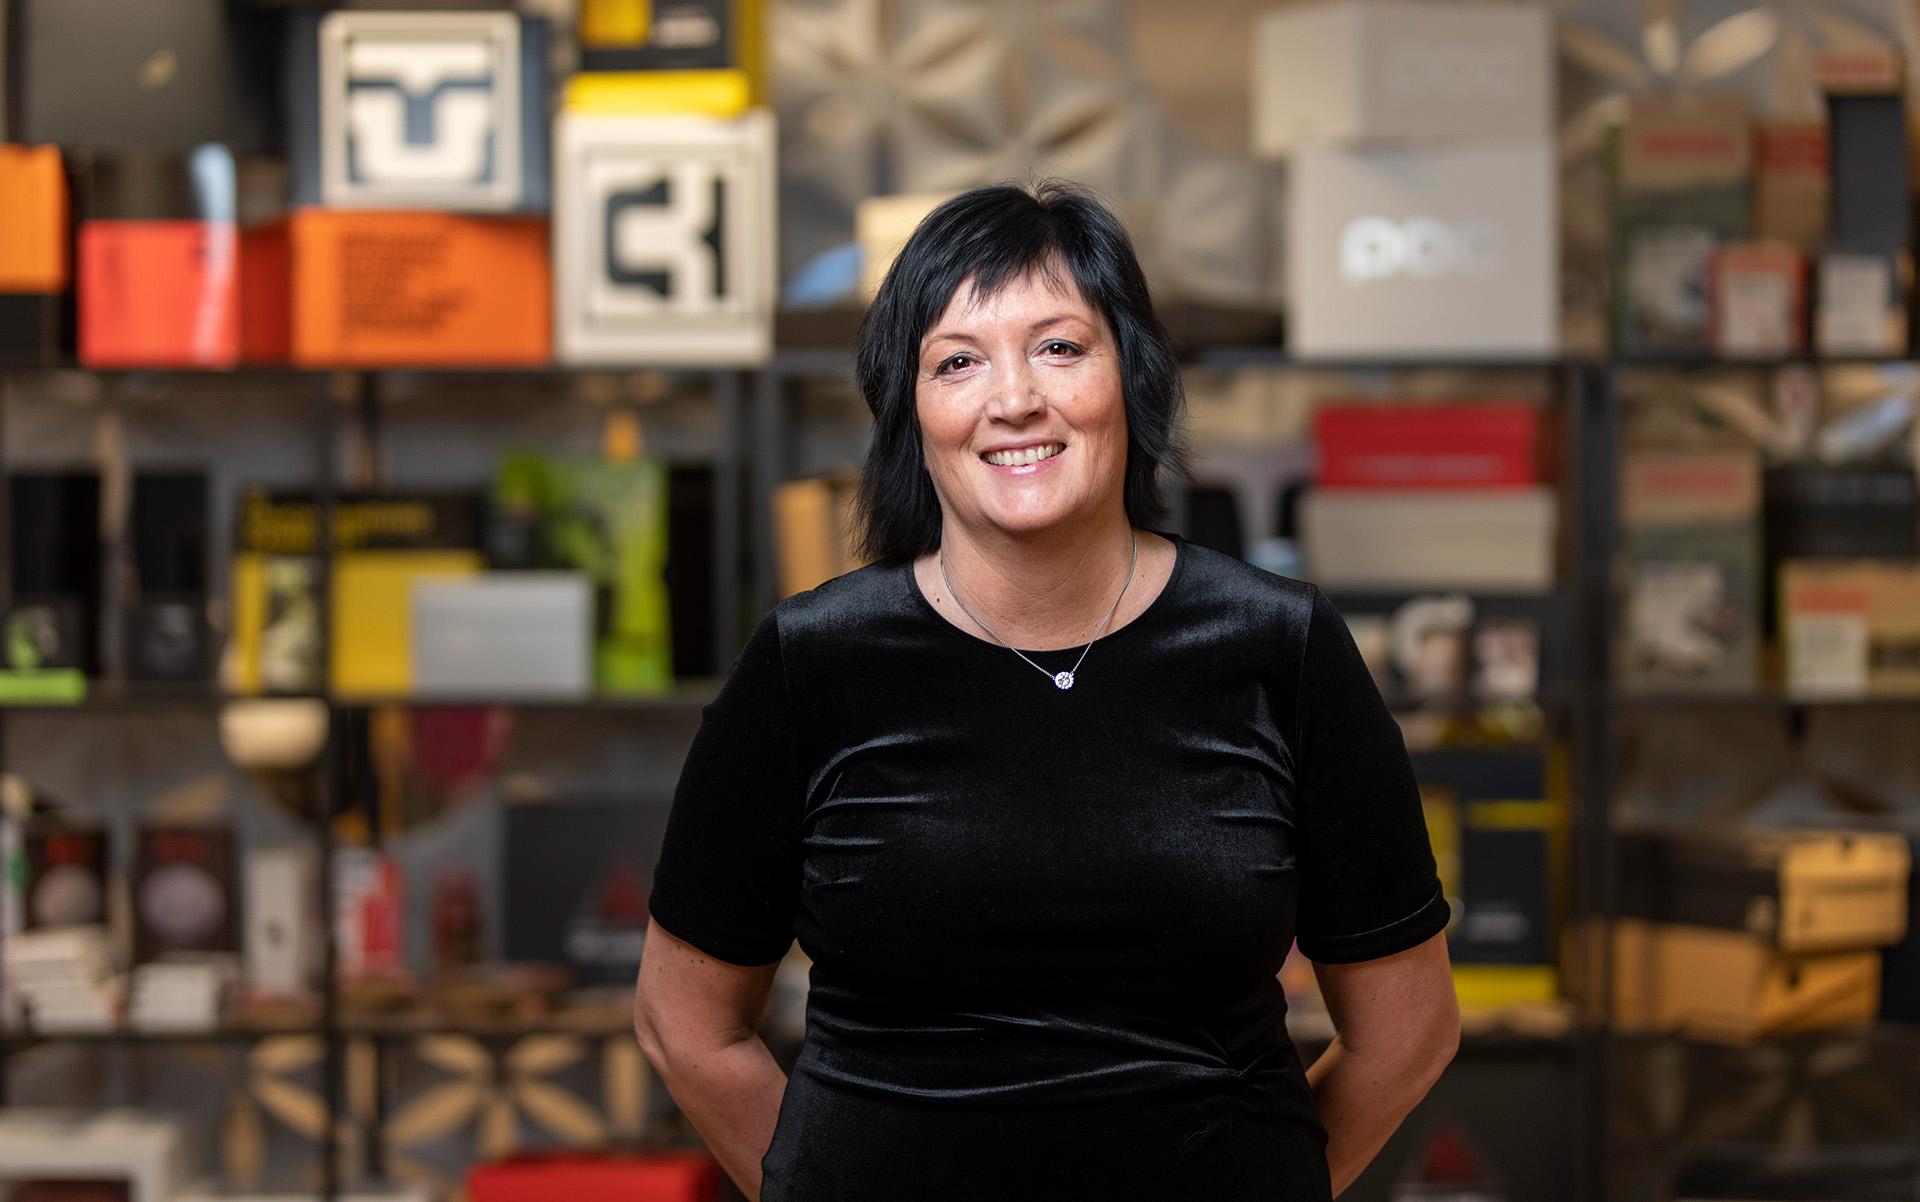 Directrice générale de BillerudKorsnäs, Petra Einarsson